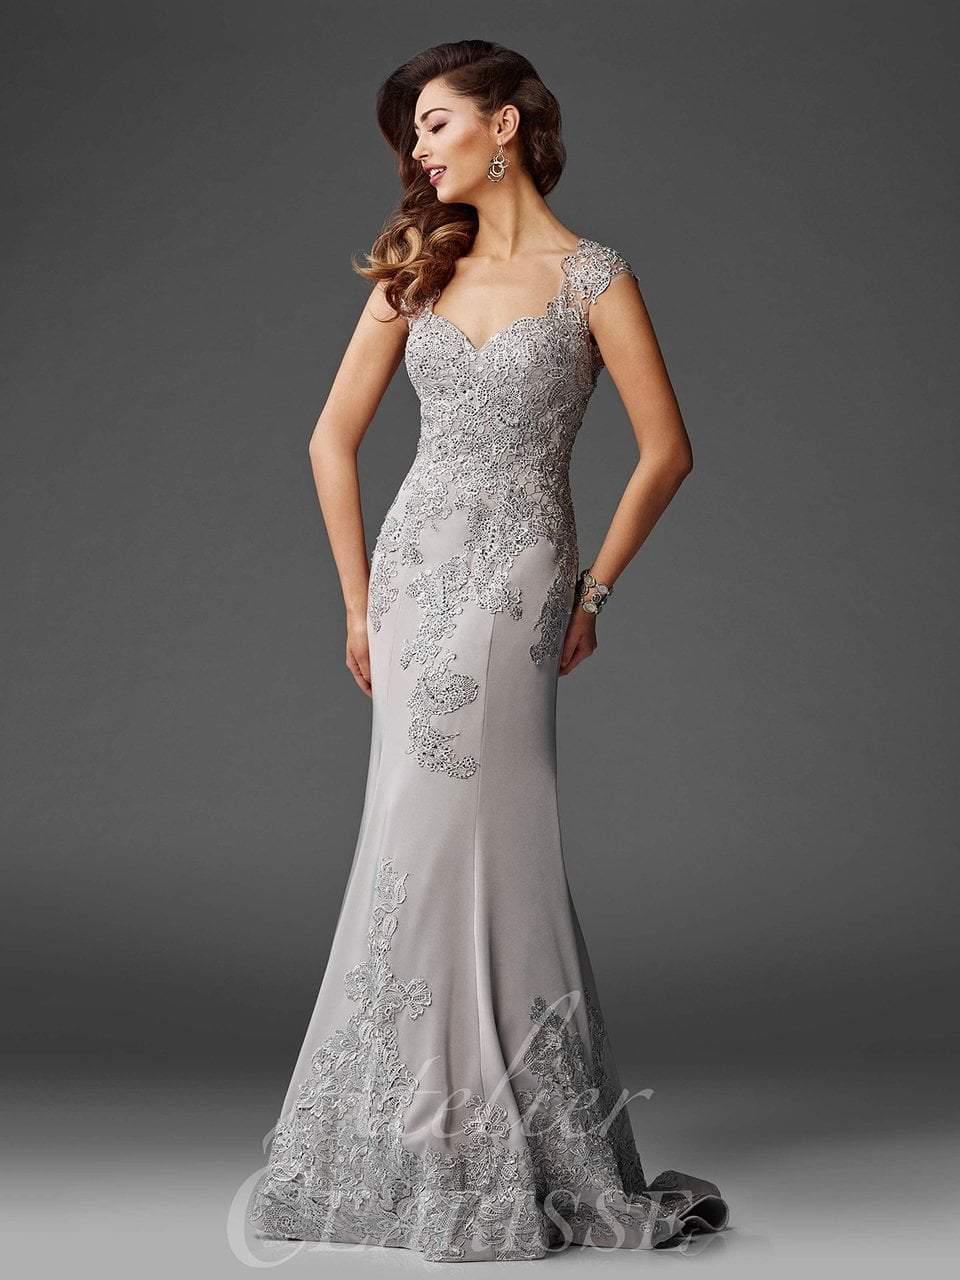 Clarisse - M6421 Sweetheart Lace Applique Evening Gown